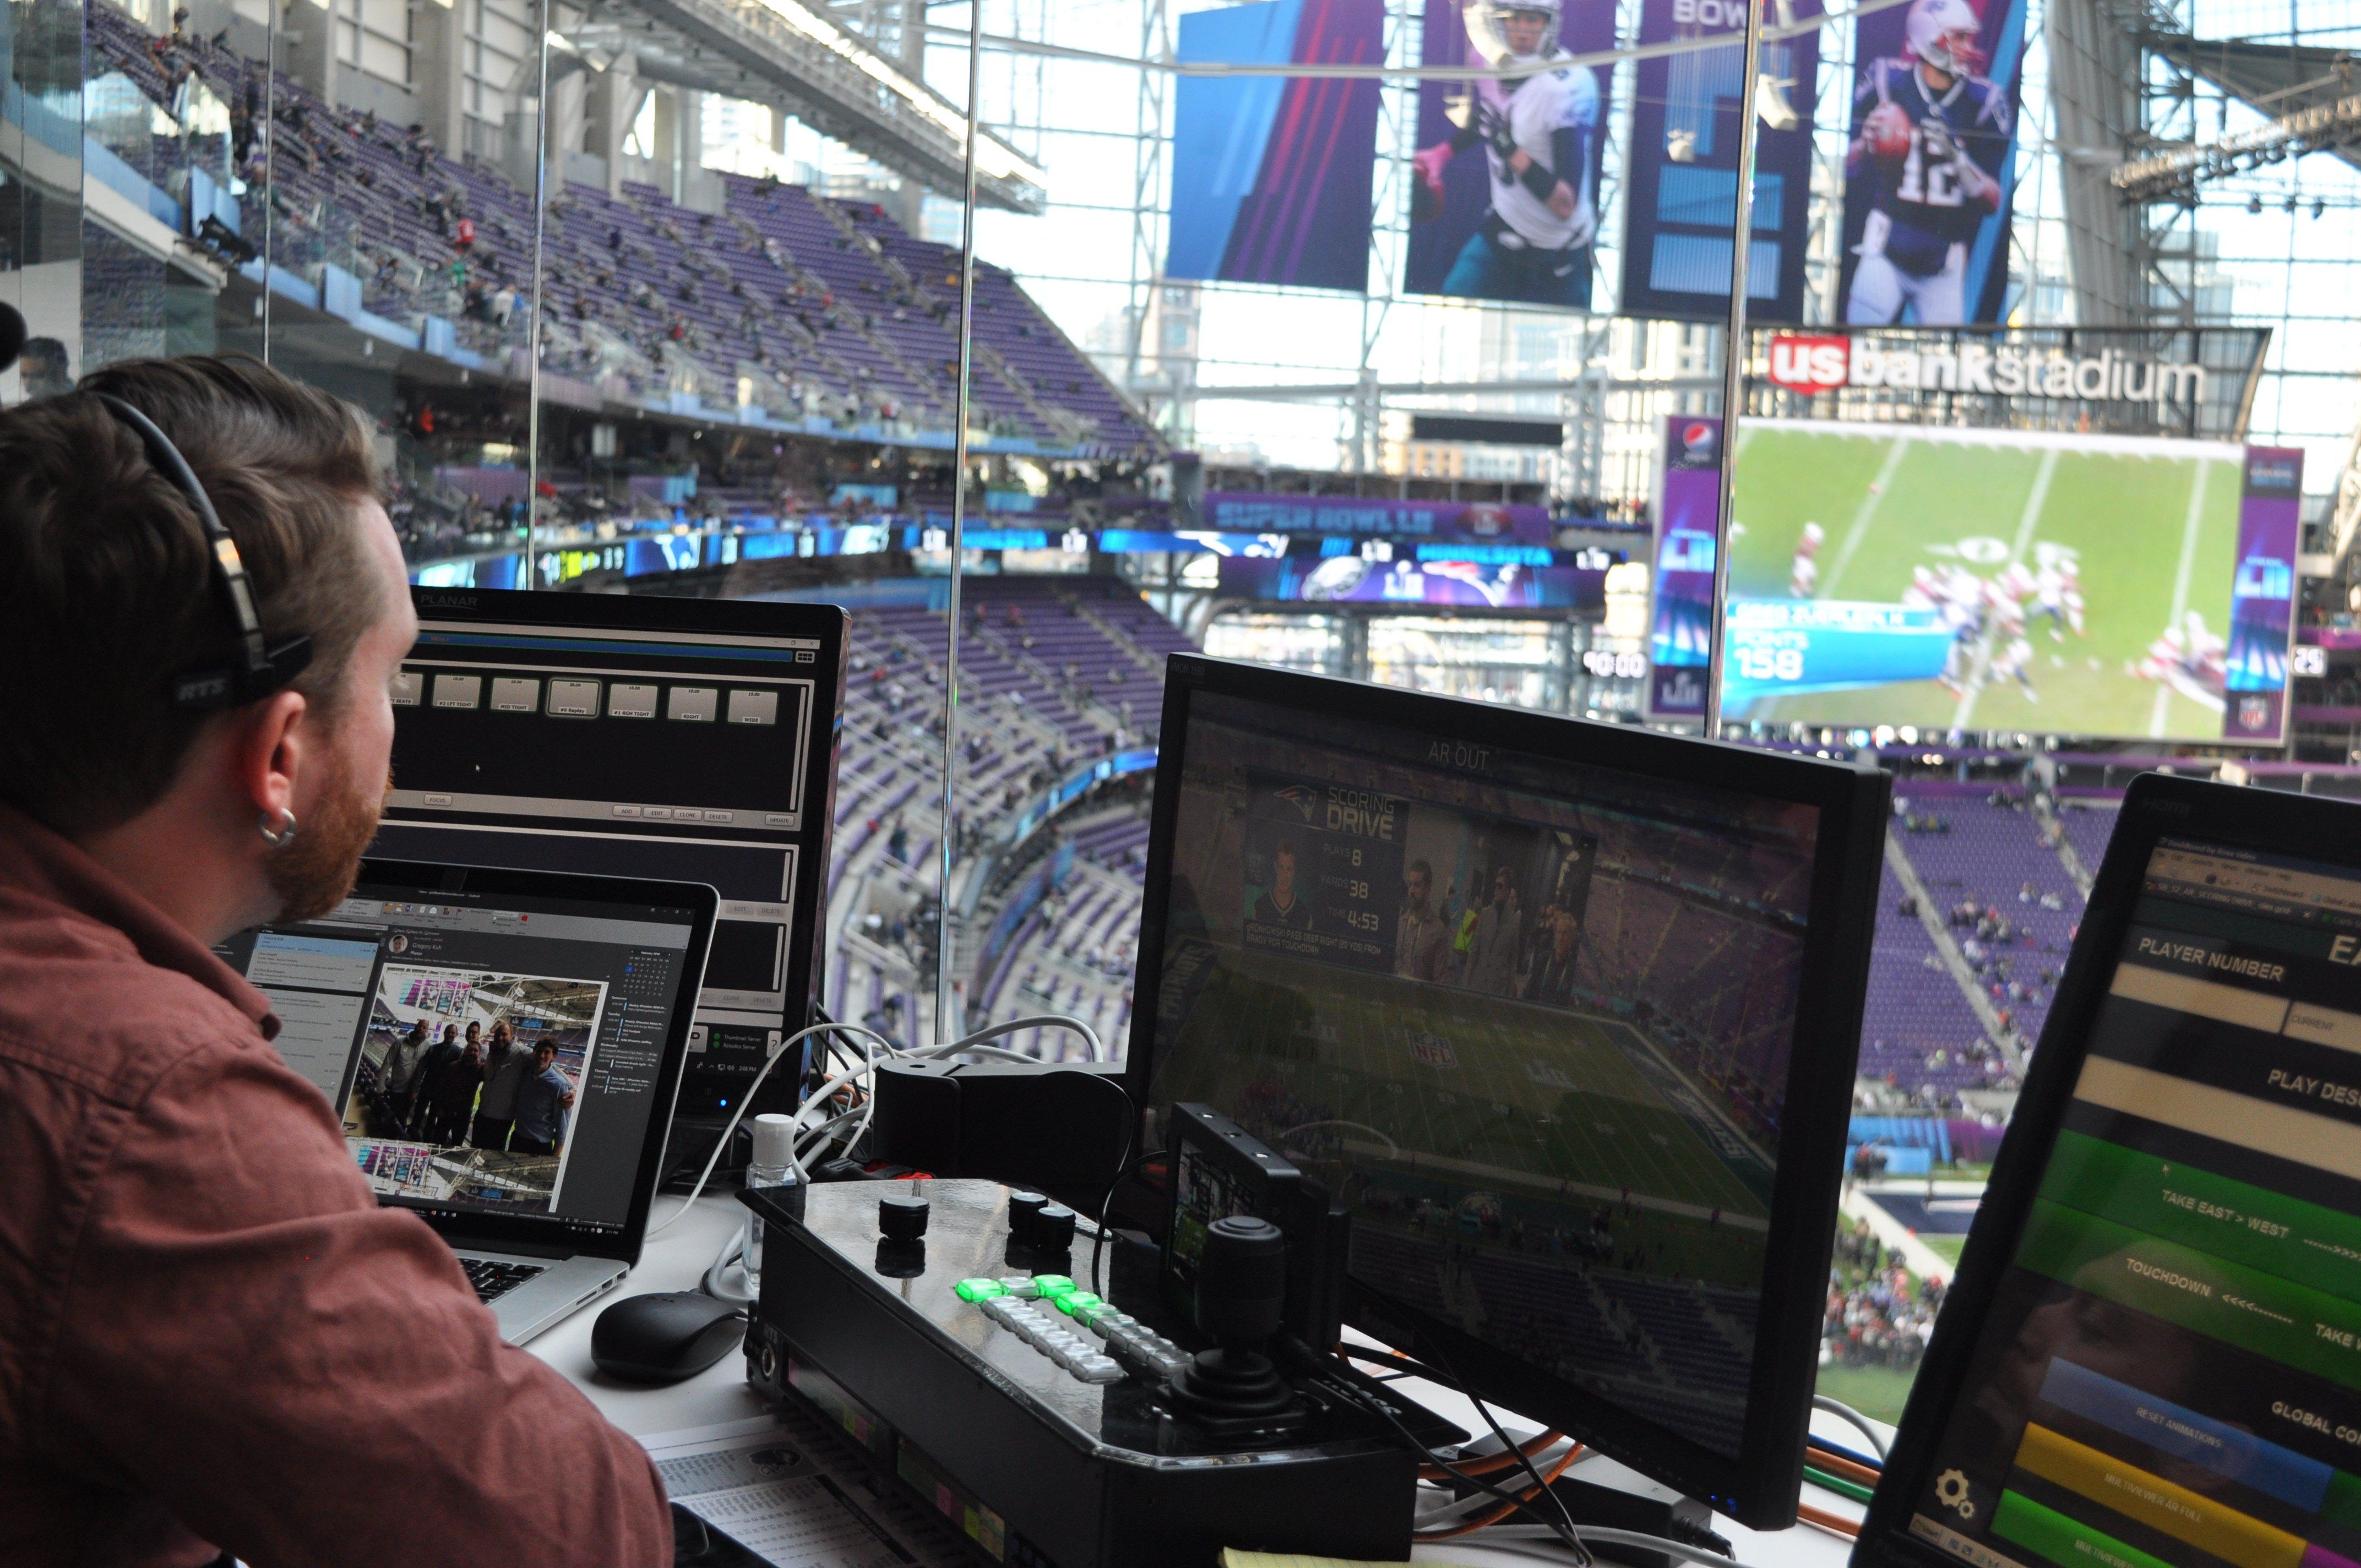 Operator using software at US Bank Stadium